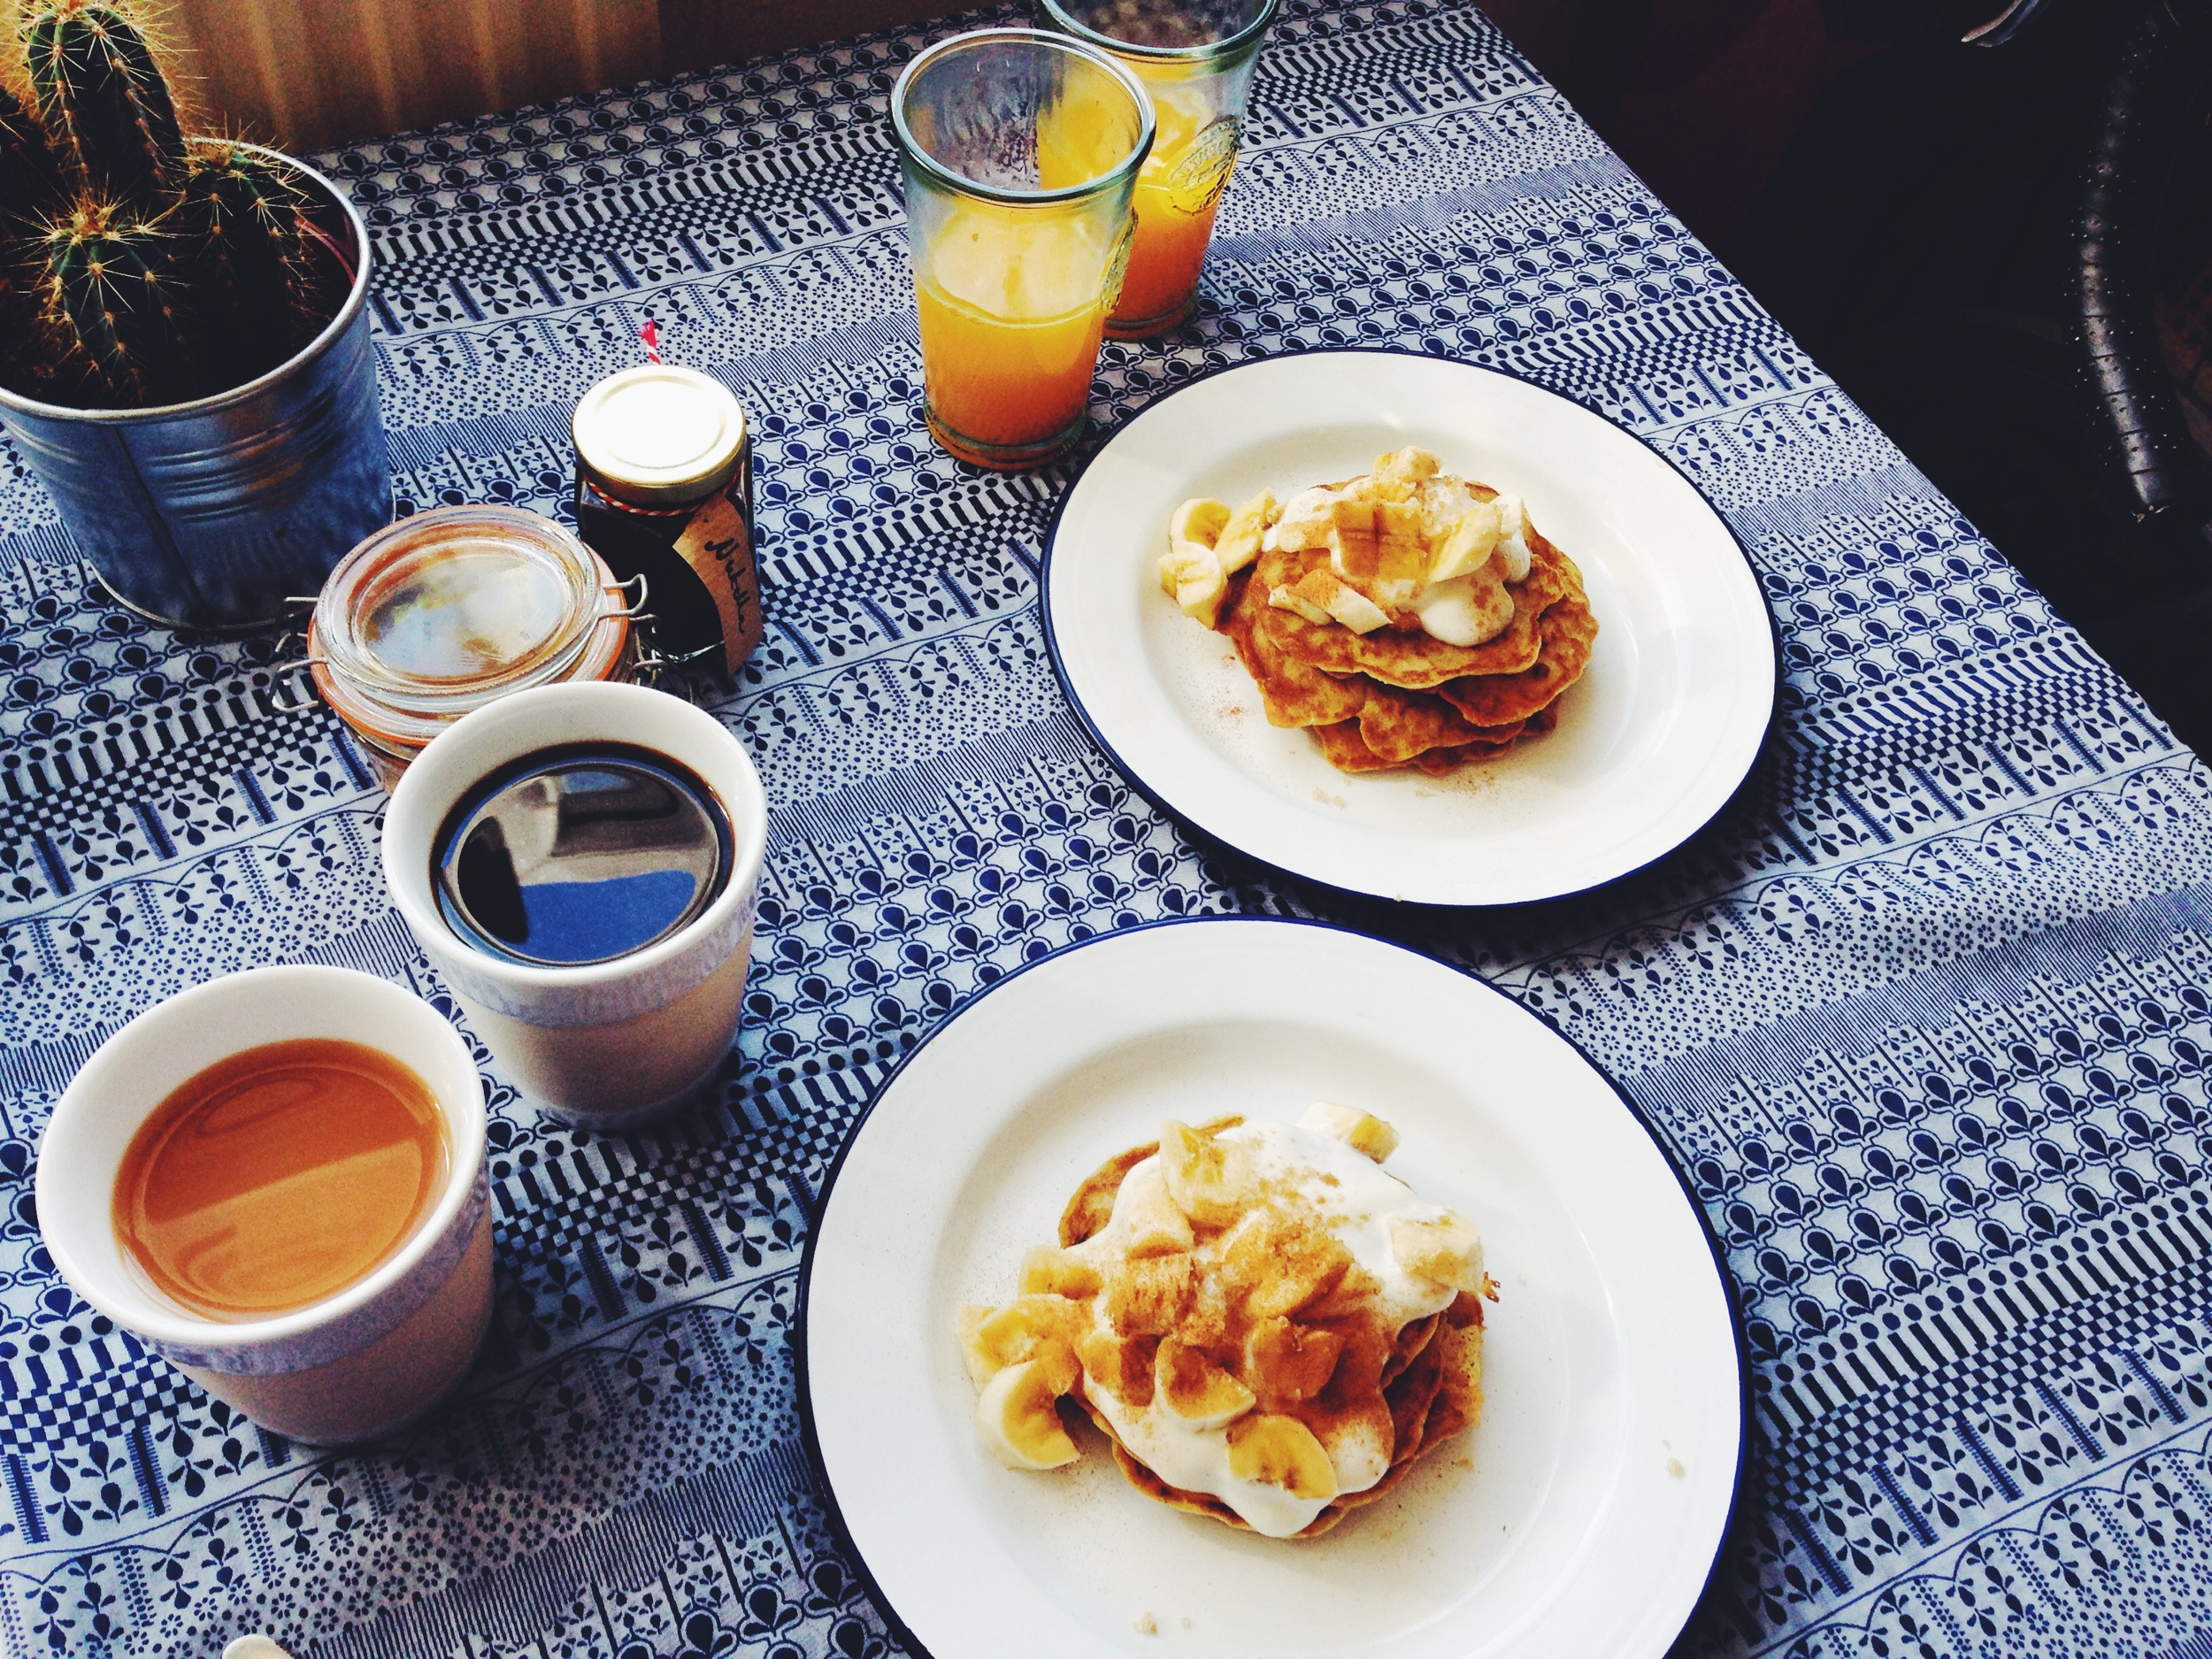 banana and soy yoghurt pancakes